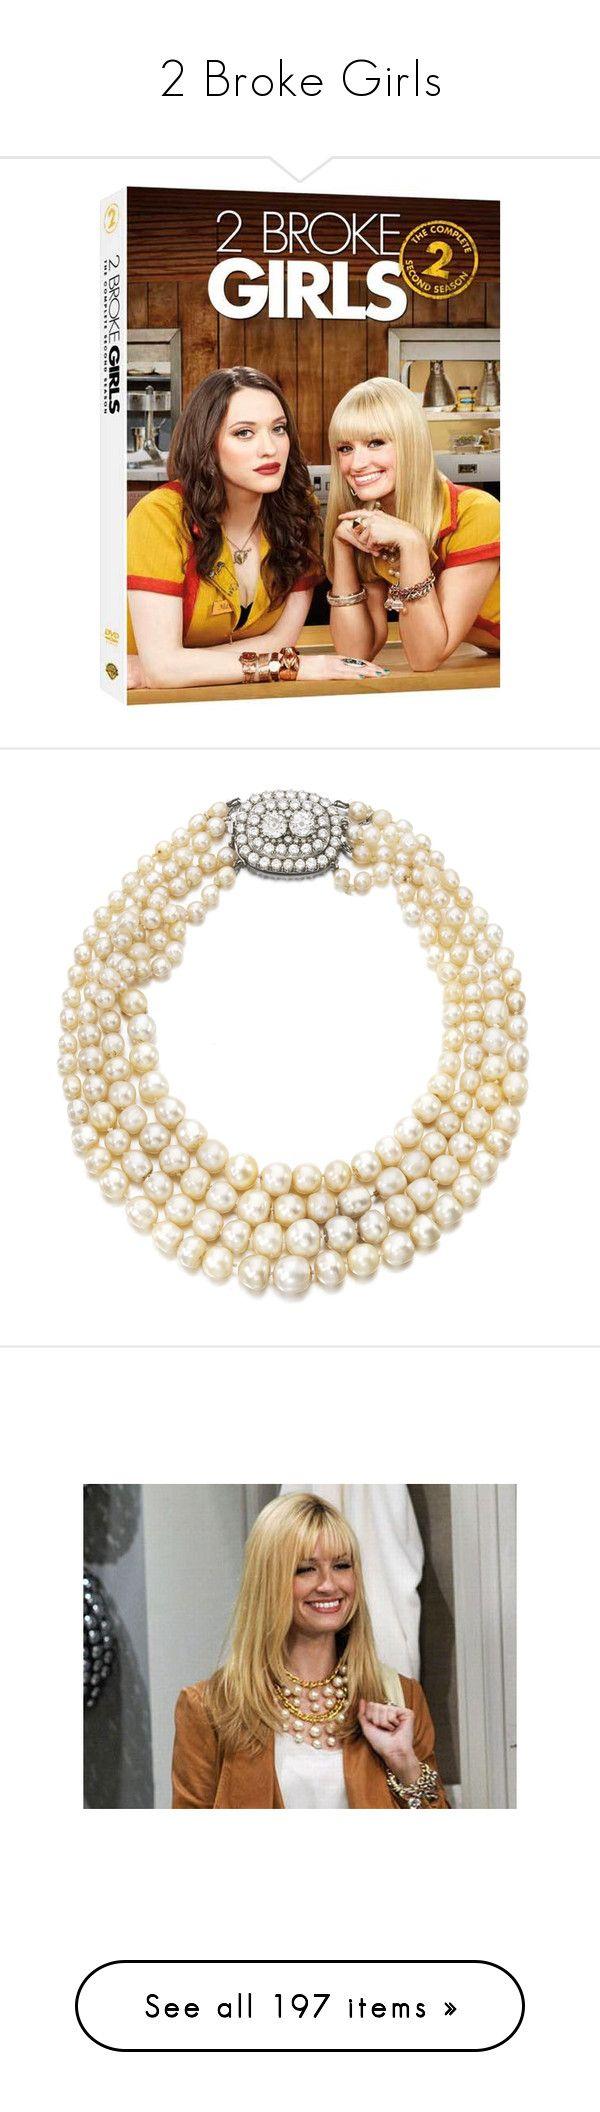 """2 Broke Girls"" by styleskater7 ❤ liked on Polyvore featuring Max, Caroline, 2 broke girls, jewelry, necklaces, colar, fresh water pearl jewelry, pearl jewelry, freshwater pearl necklace and white pearl necklace"